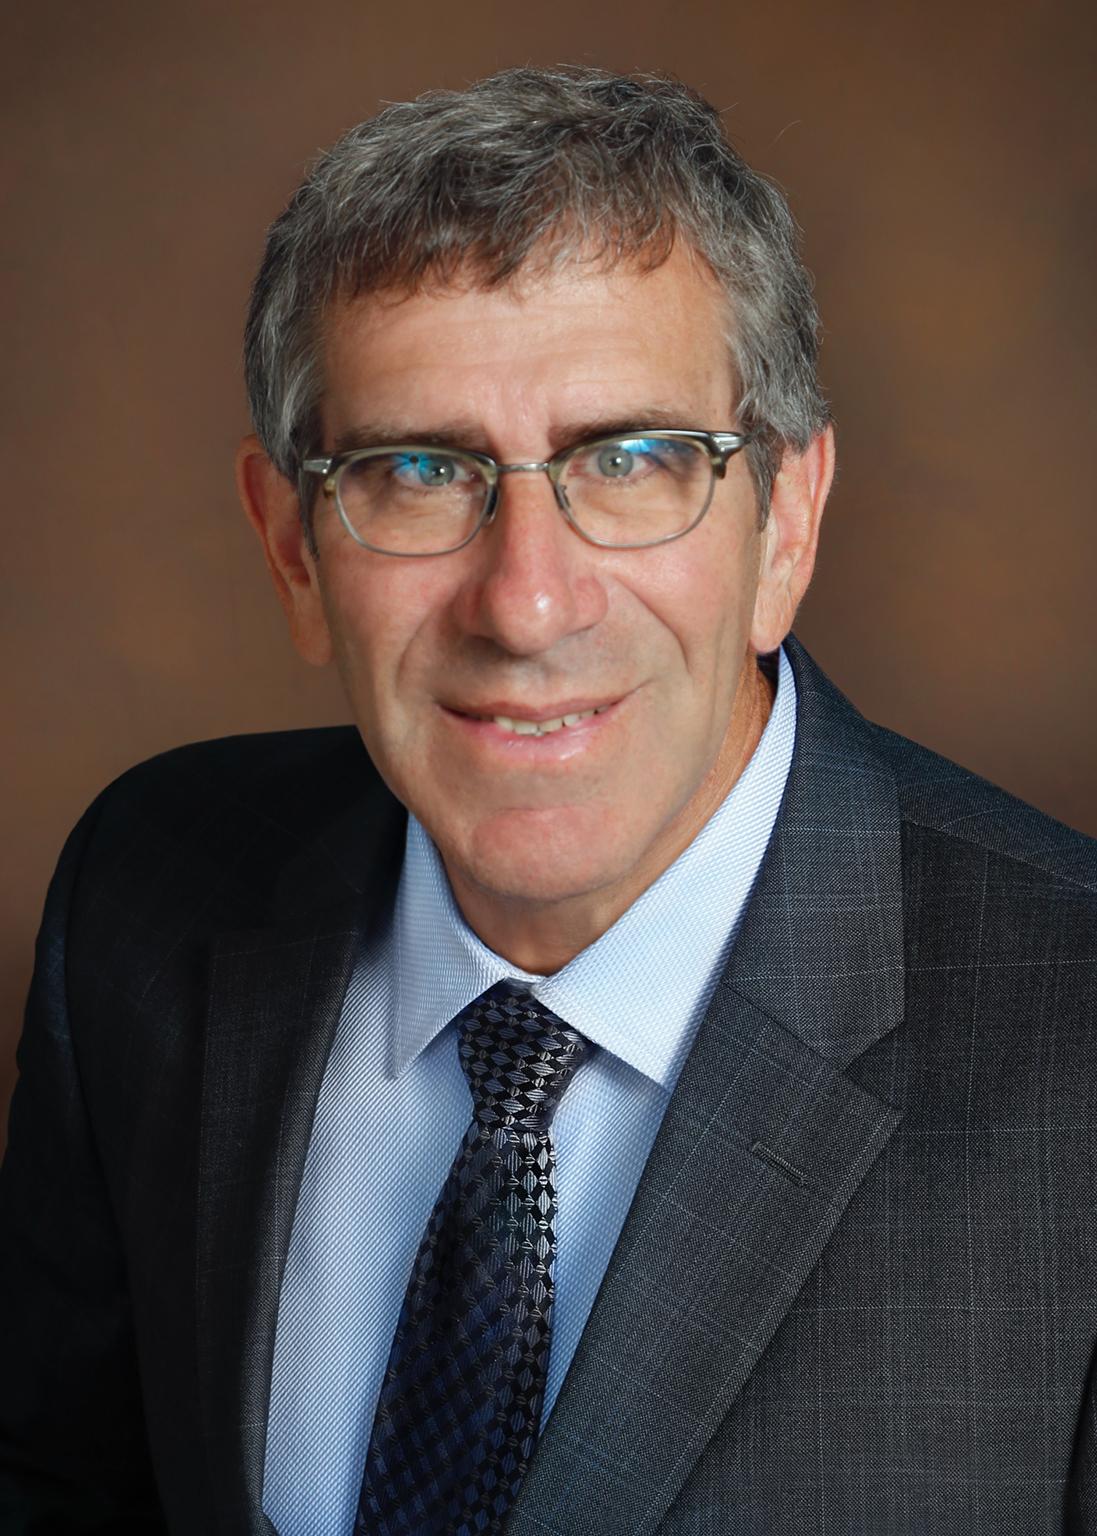 John Millan - Chief Financial Officer